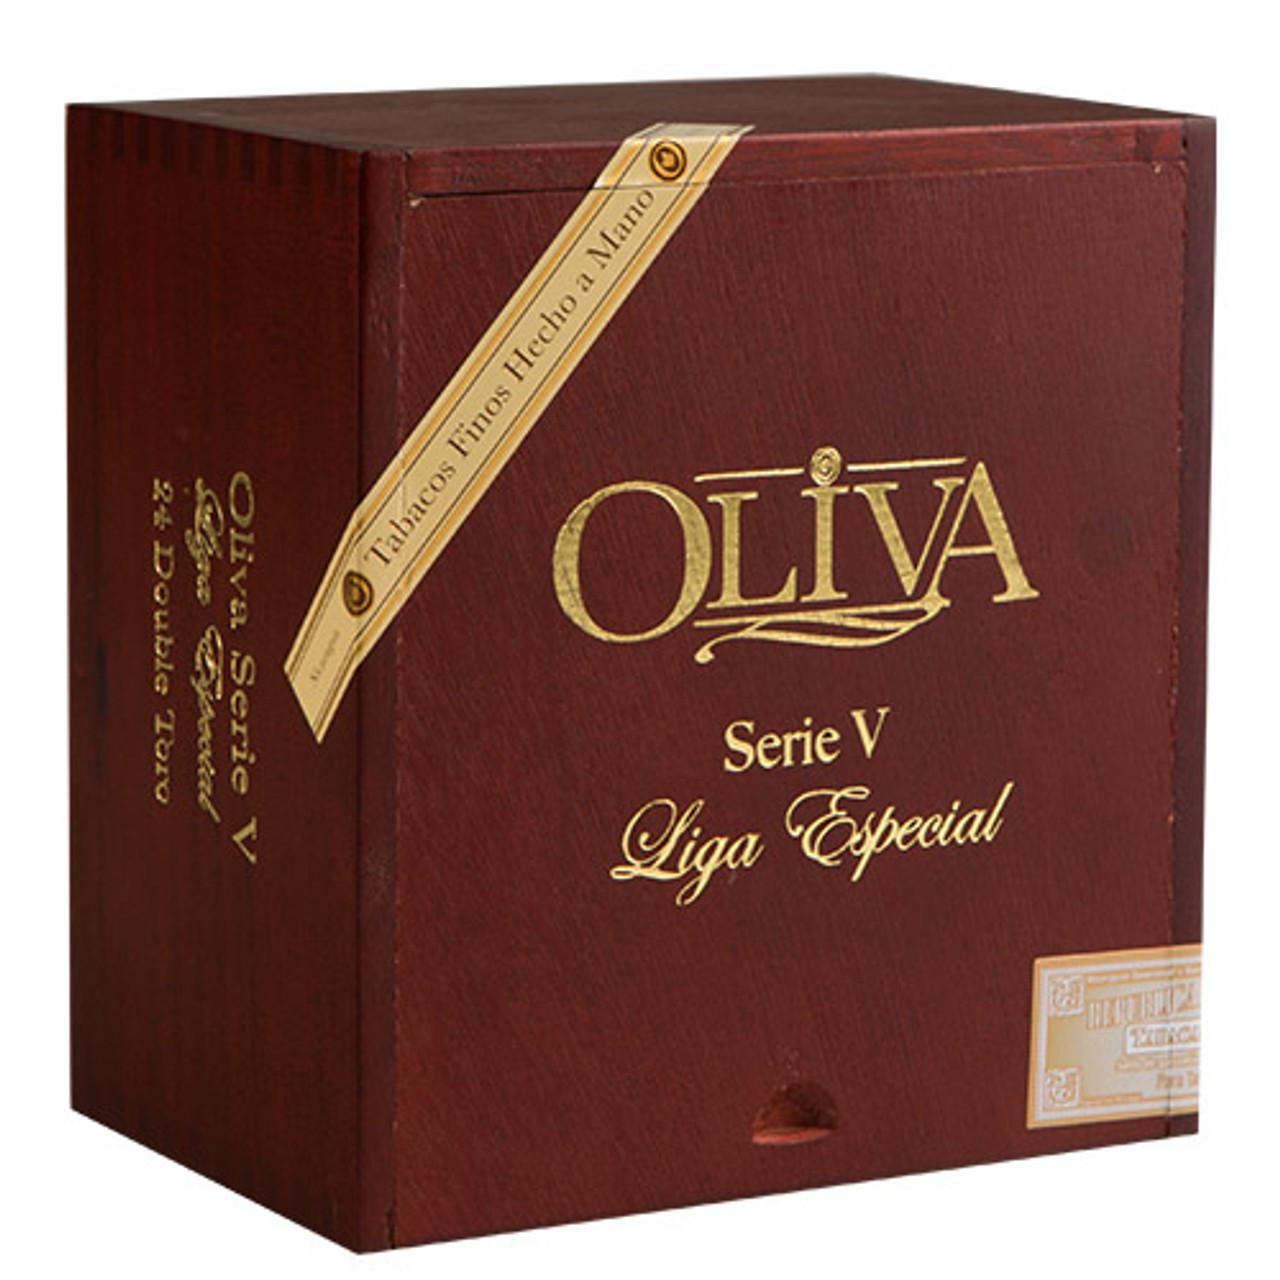 Oliva Serie V Special V Figurado Cigars - 6 x 60 (Box of 24)